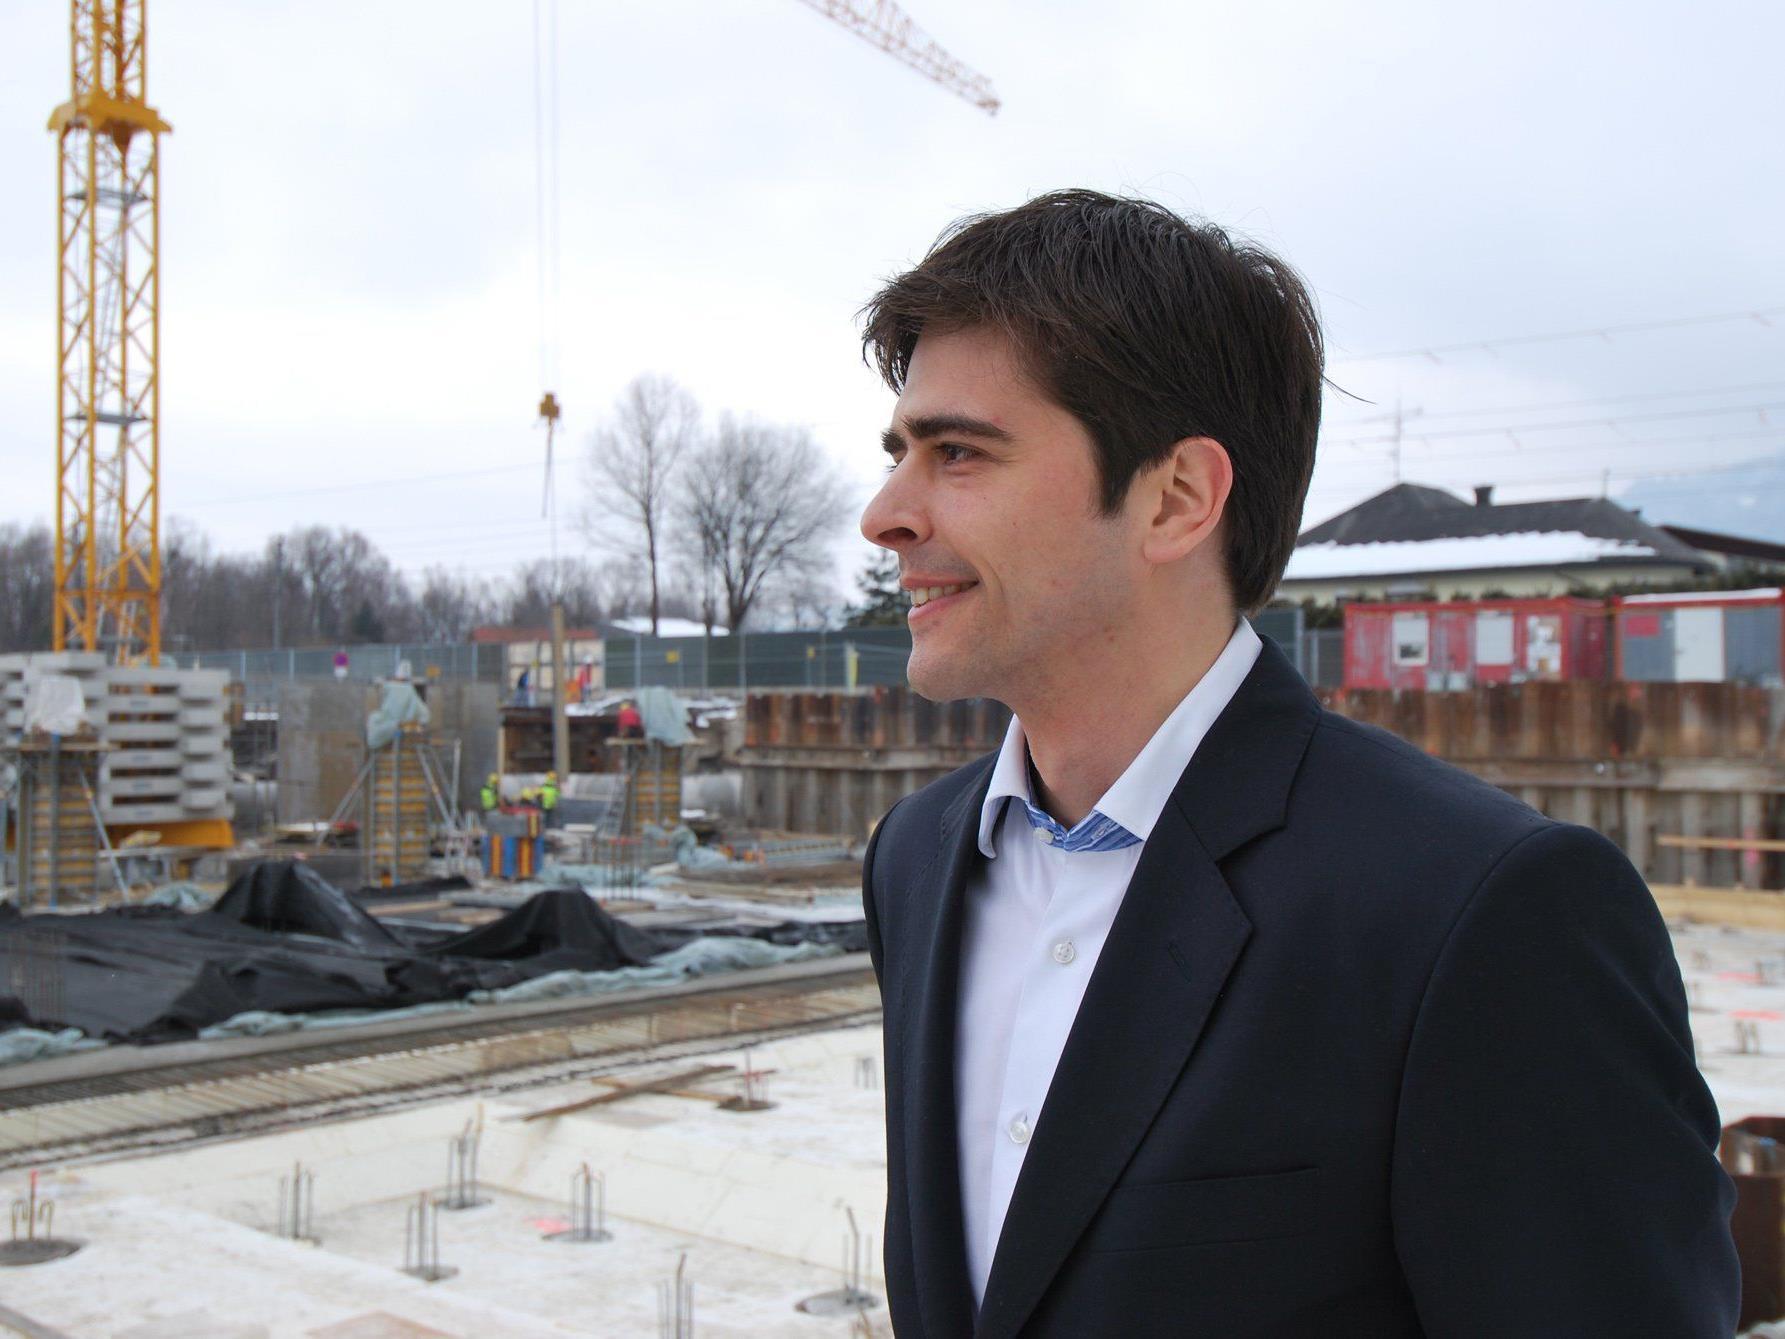 Zumtobel Projektleiter Clemens Bechter